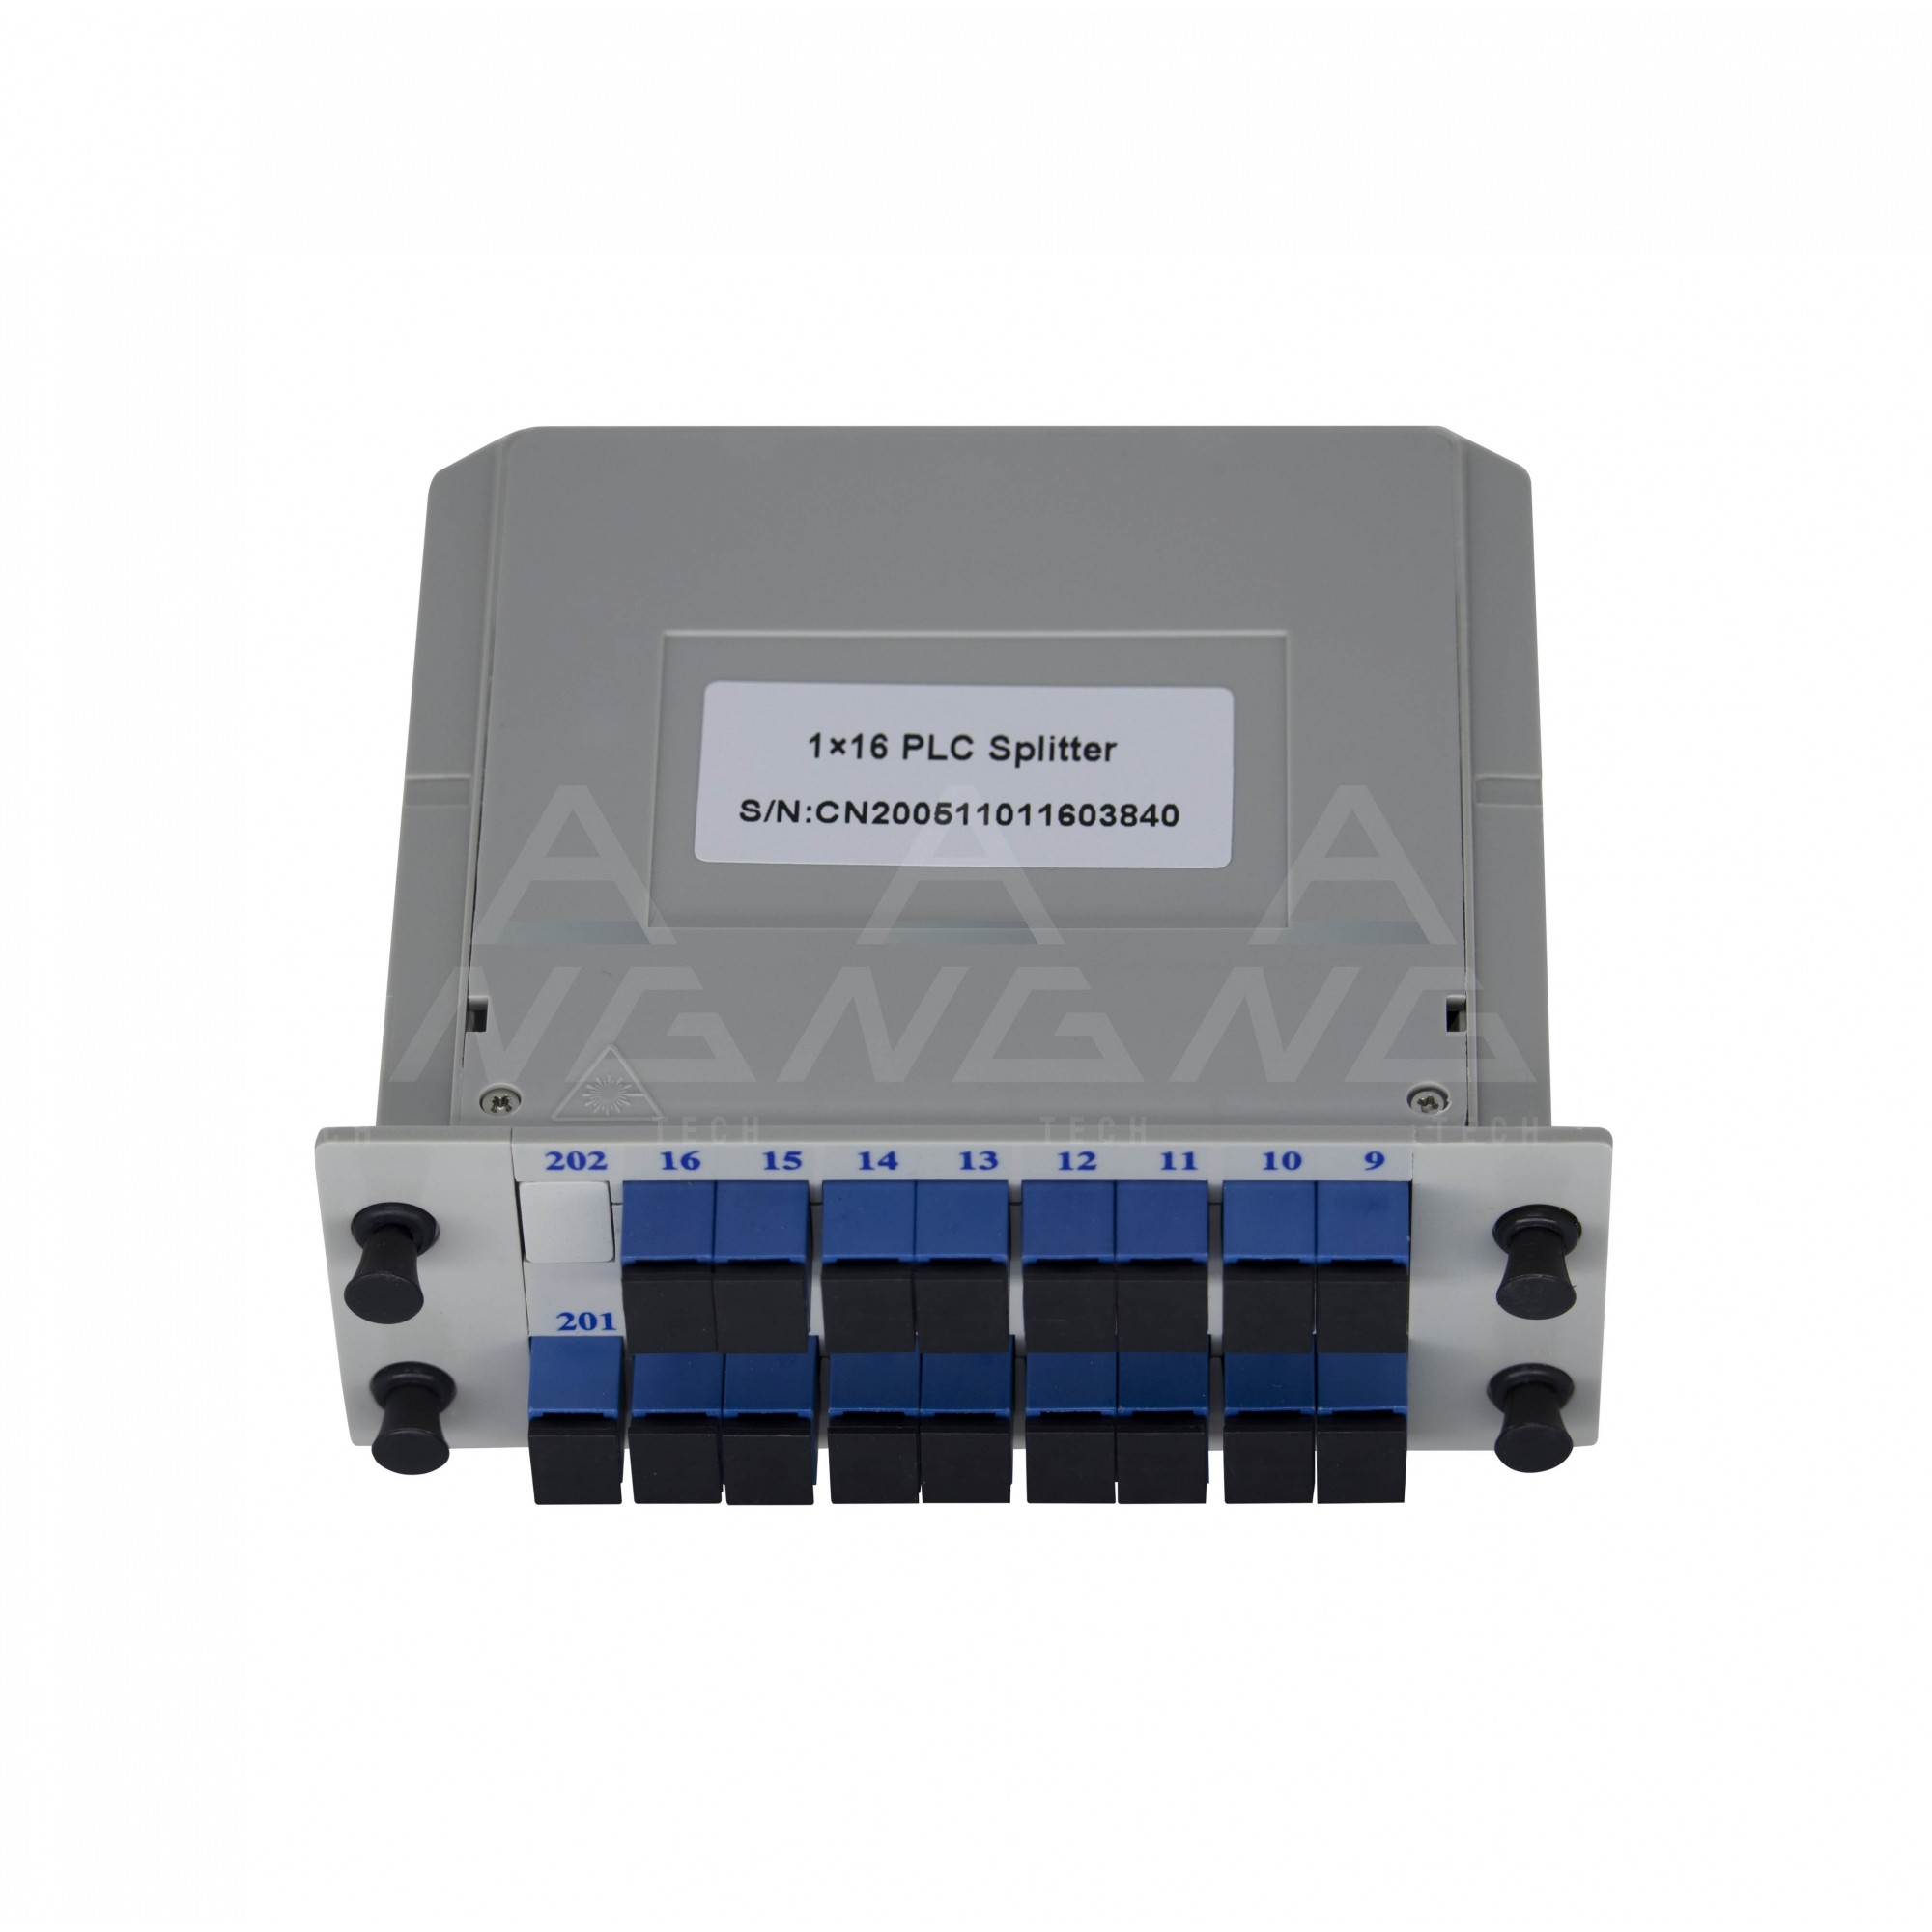 Splitter Cassete 1.16 com conector SC/UPC - Modular